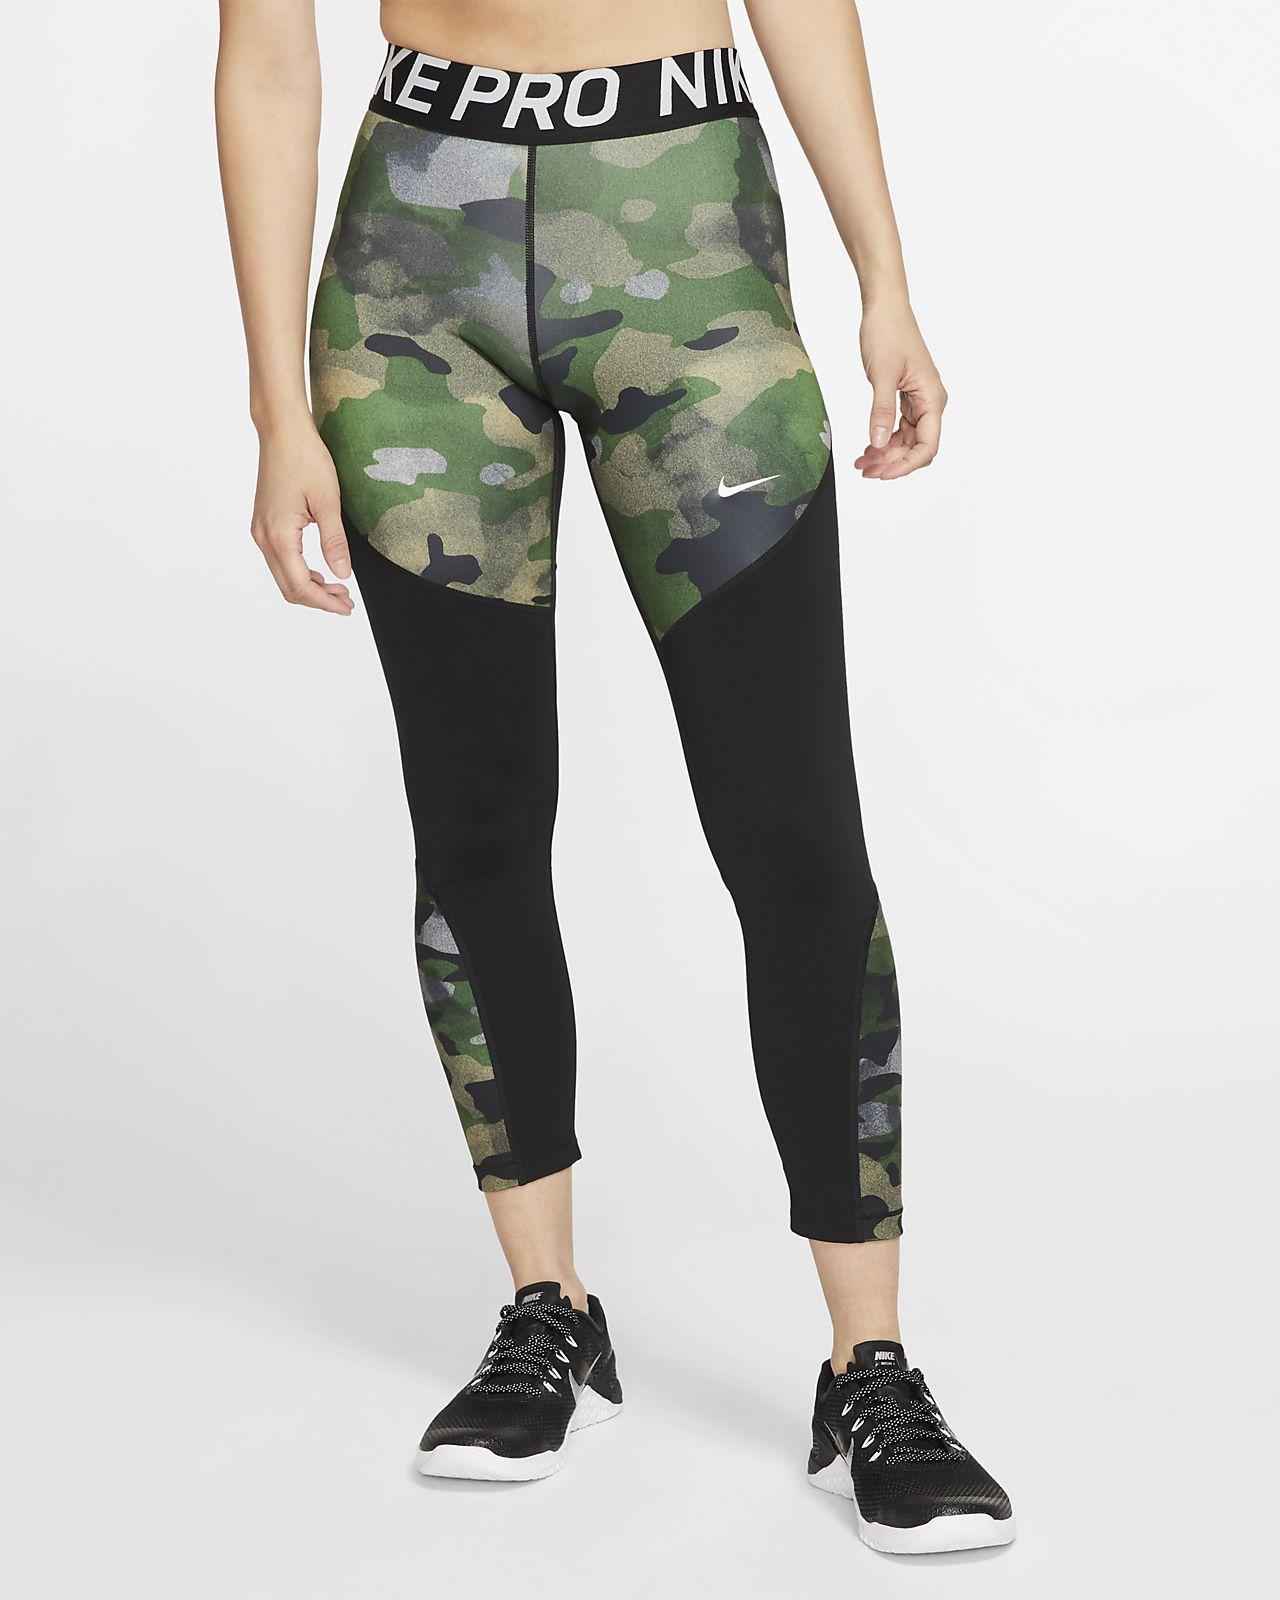 Nike Pro Women's Camo Tights